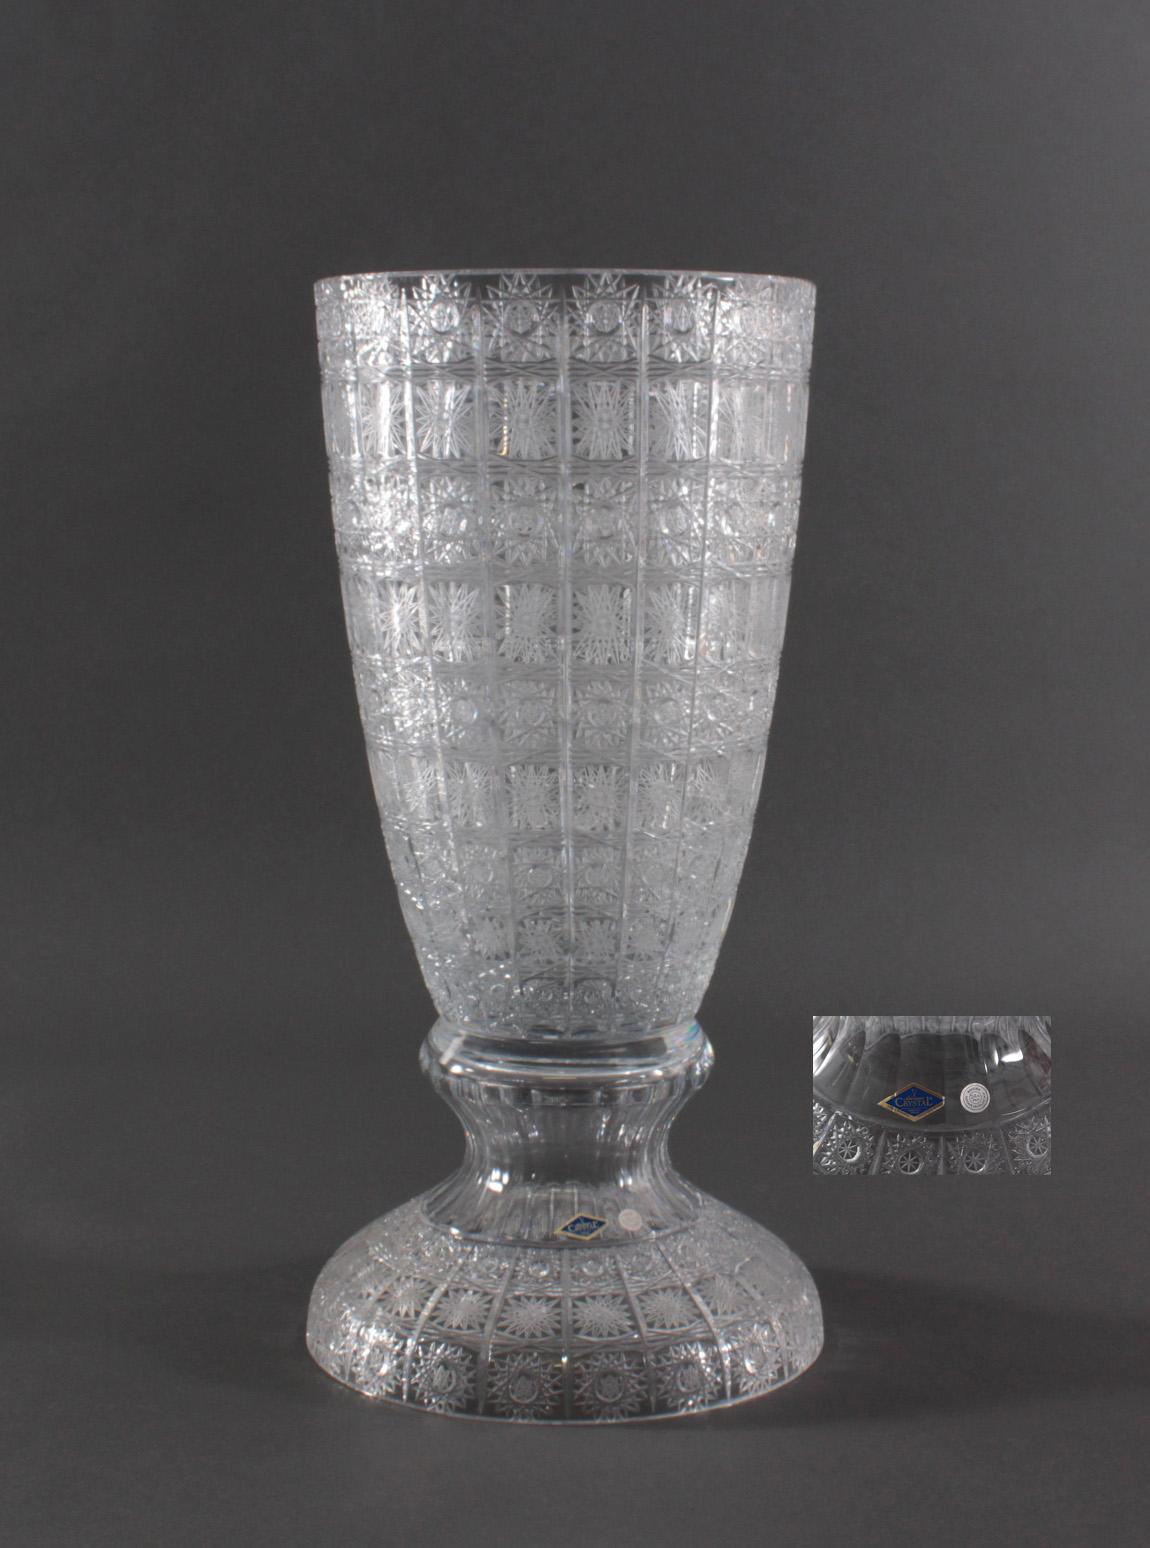 Sehr große dekorative Bleikristall-Vase. Bohemia Aurum-2